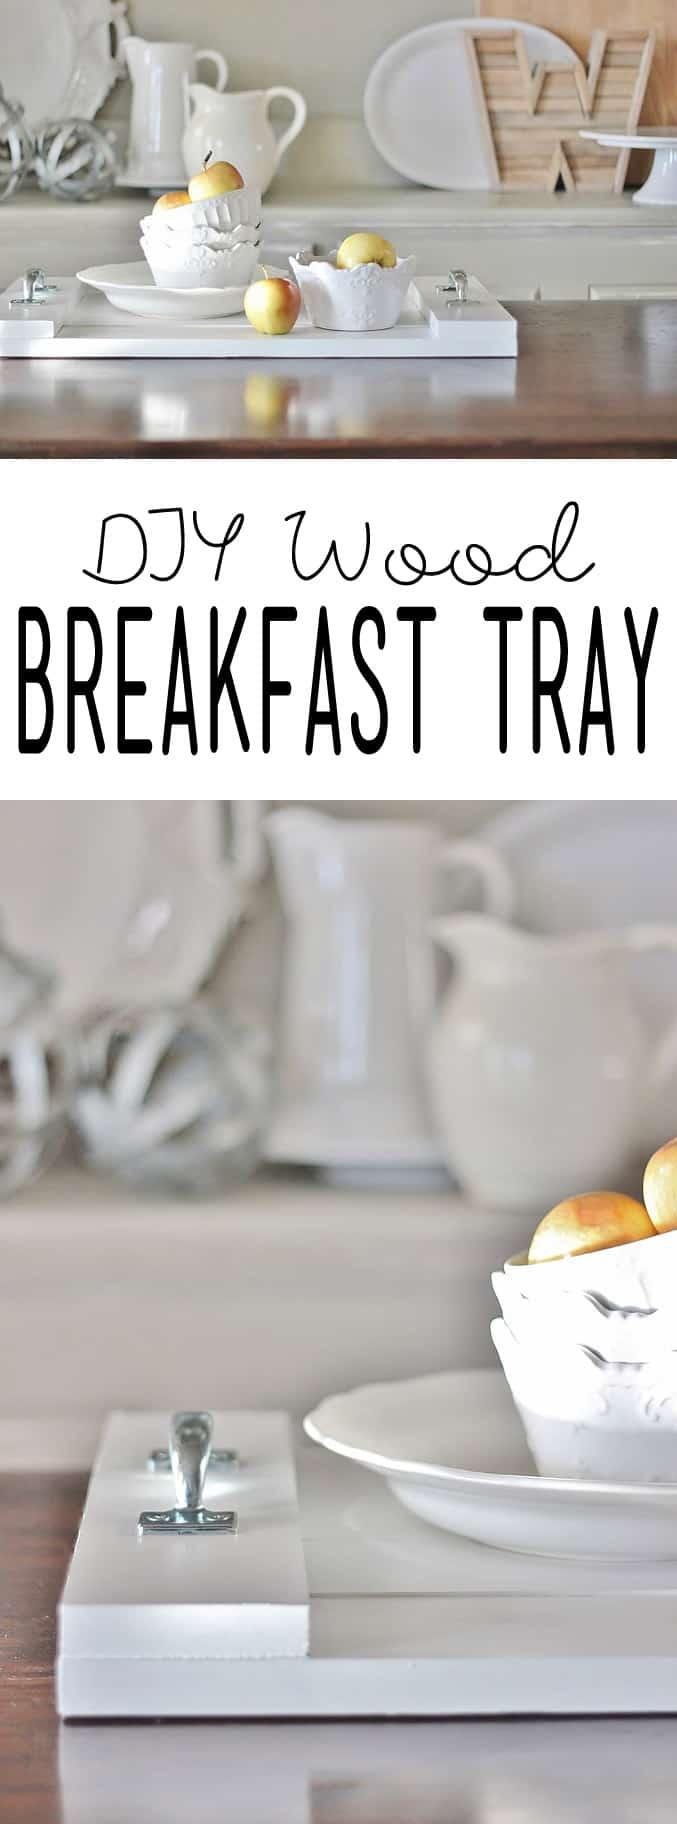 DIY-Breakfast-Tray-tower